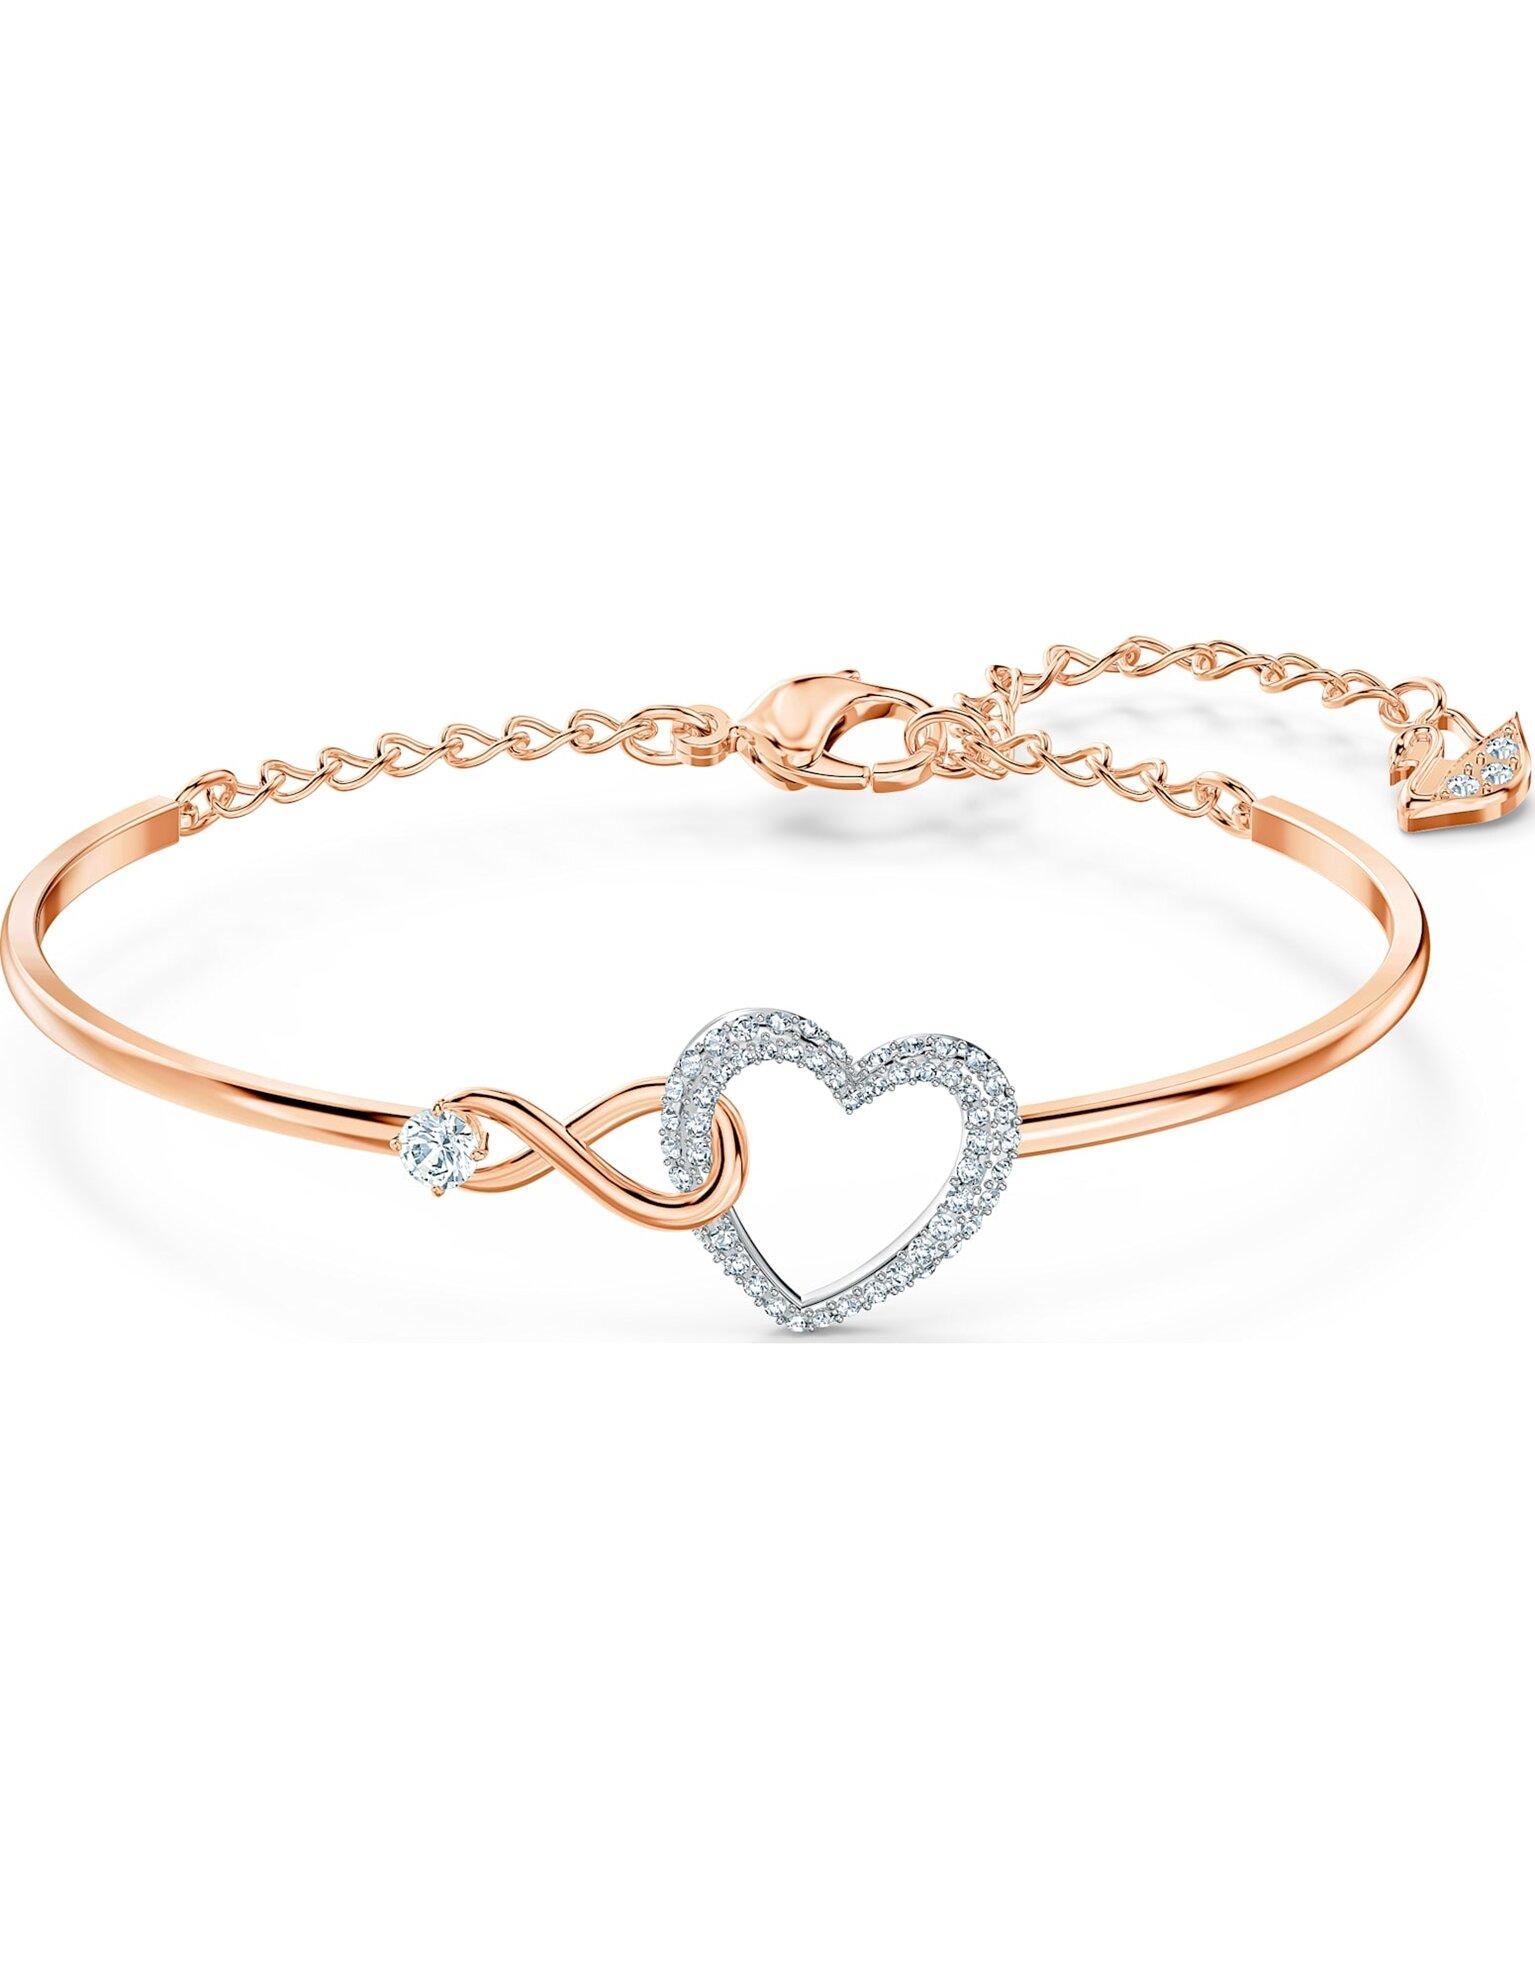 Picture of Swarovski Infinity Heart Bileklik, Beyaz, Karışık metal